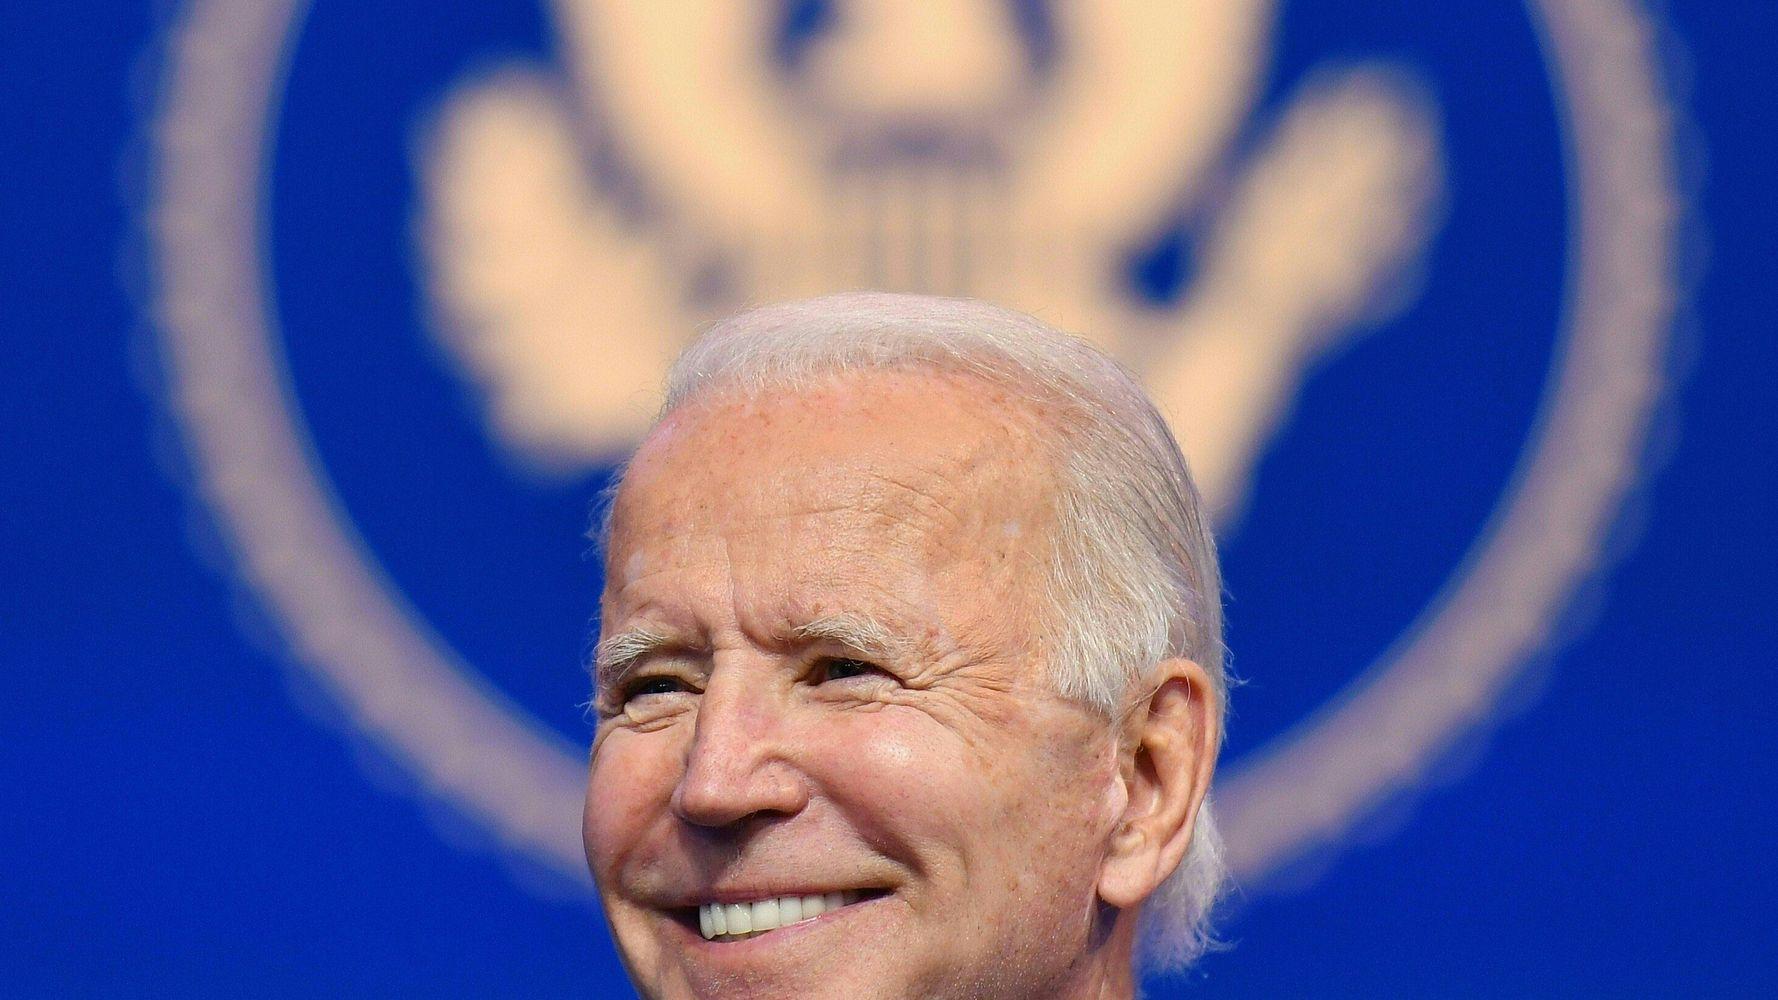 Biden Calls Trump's Refusal To Accept Election Results 'An Embarrassment'